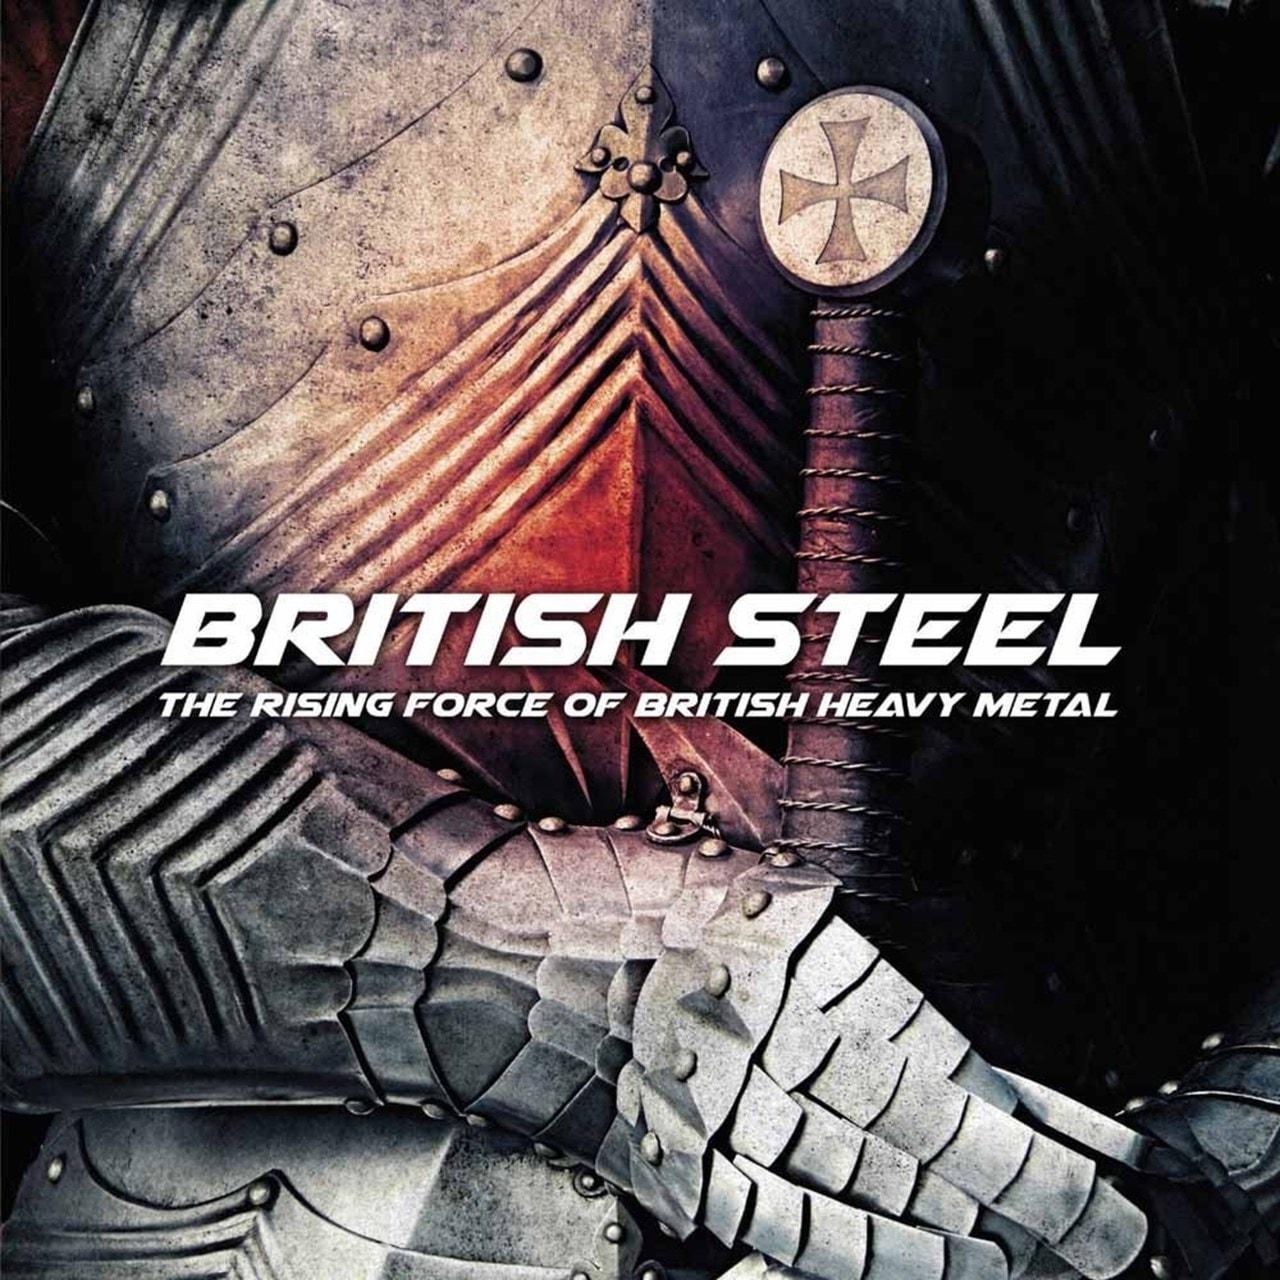 British Steel: The Rising Force of British Heavy Metal - 1